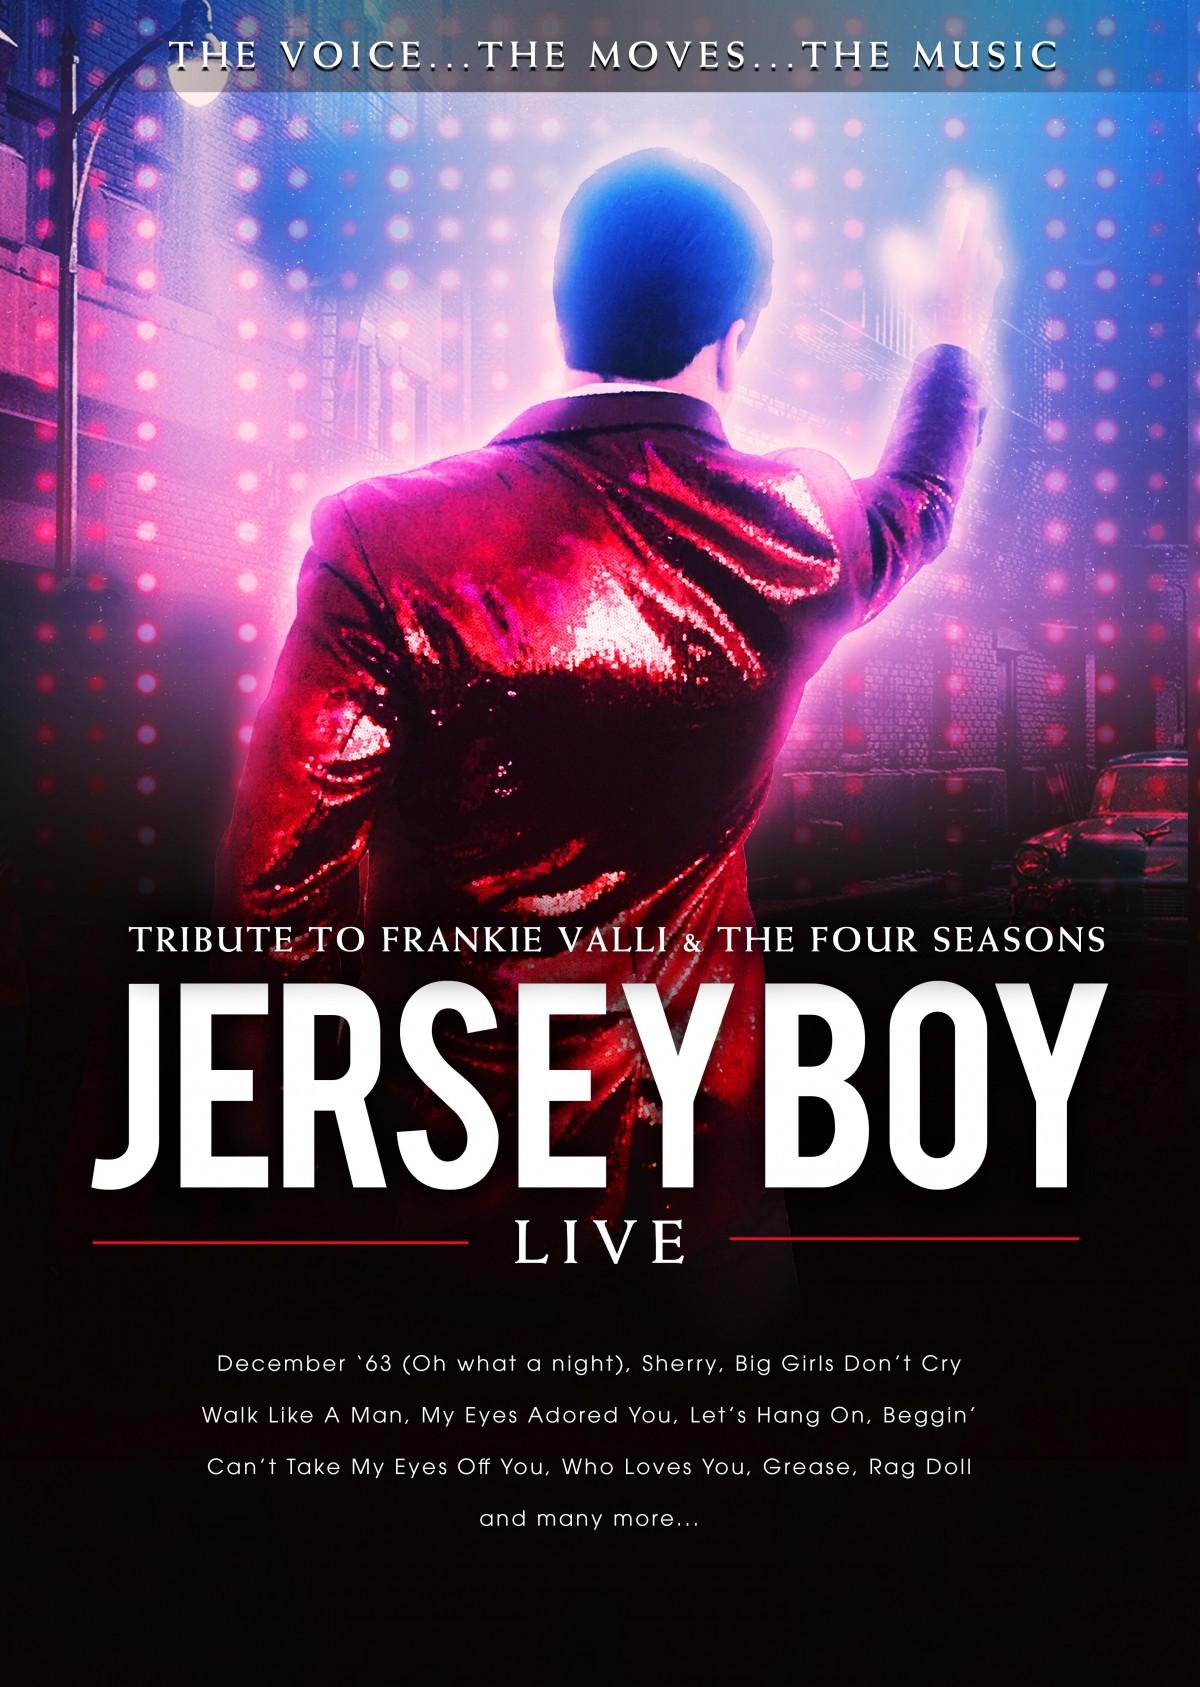 Jersey Boy Live | Frankie Valli Tribute Show | The Crossland